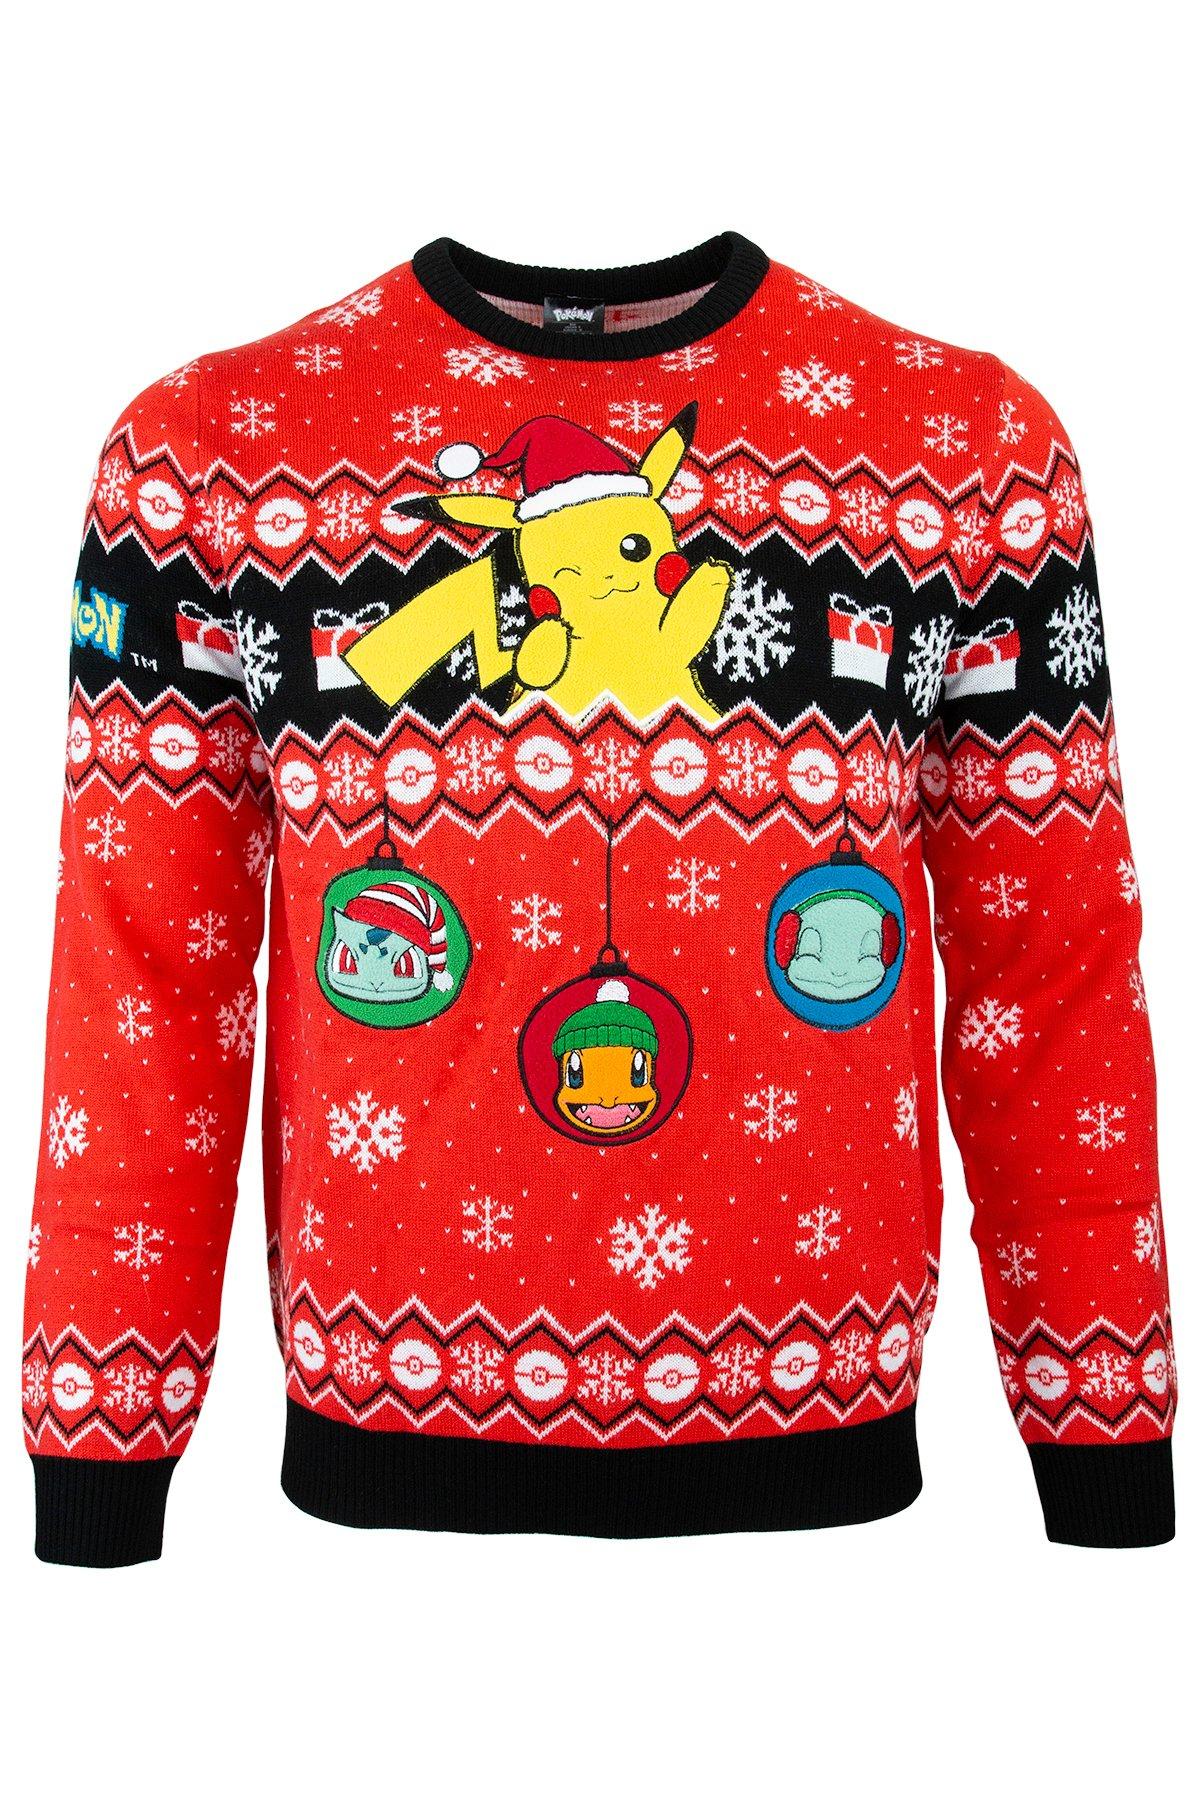 Pokémon Christmas Jumper